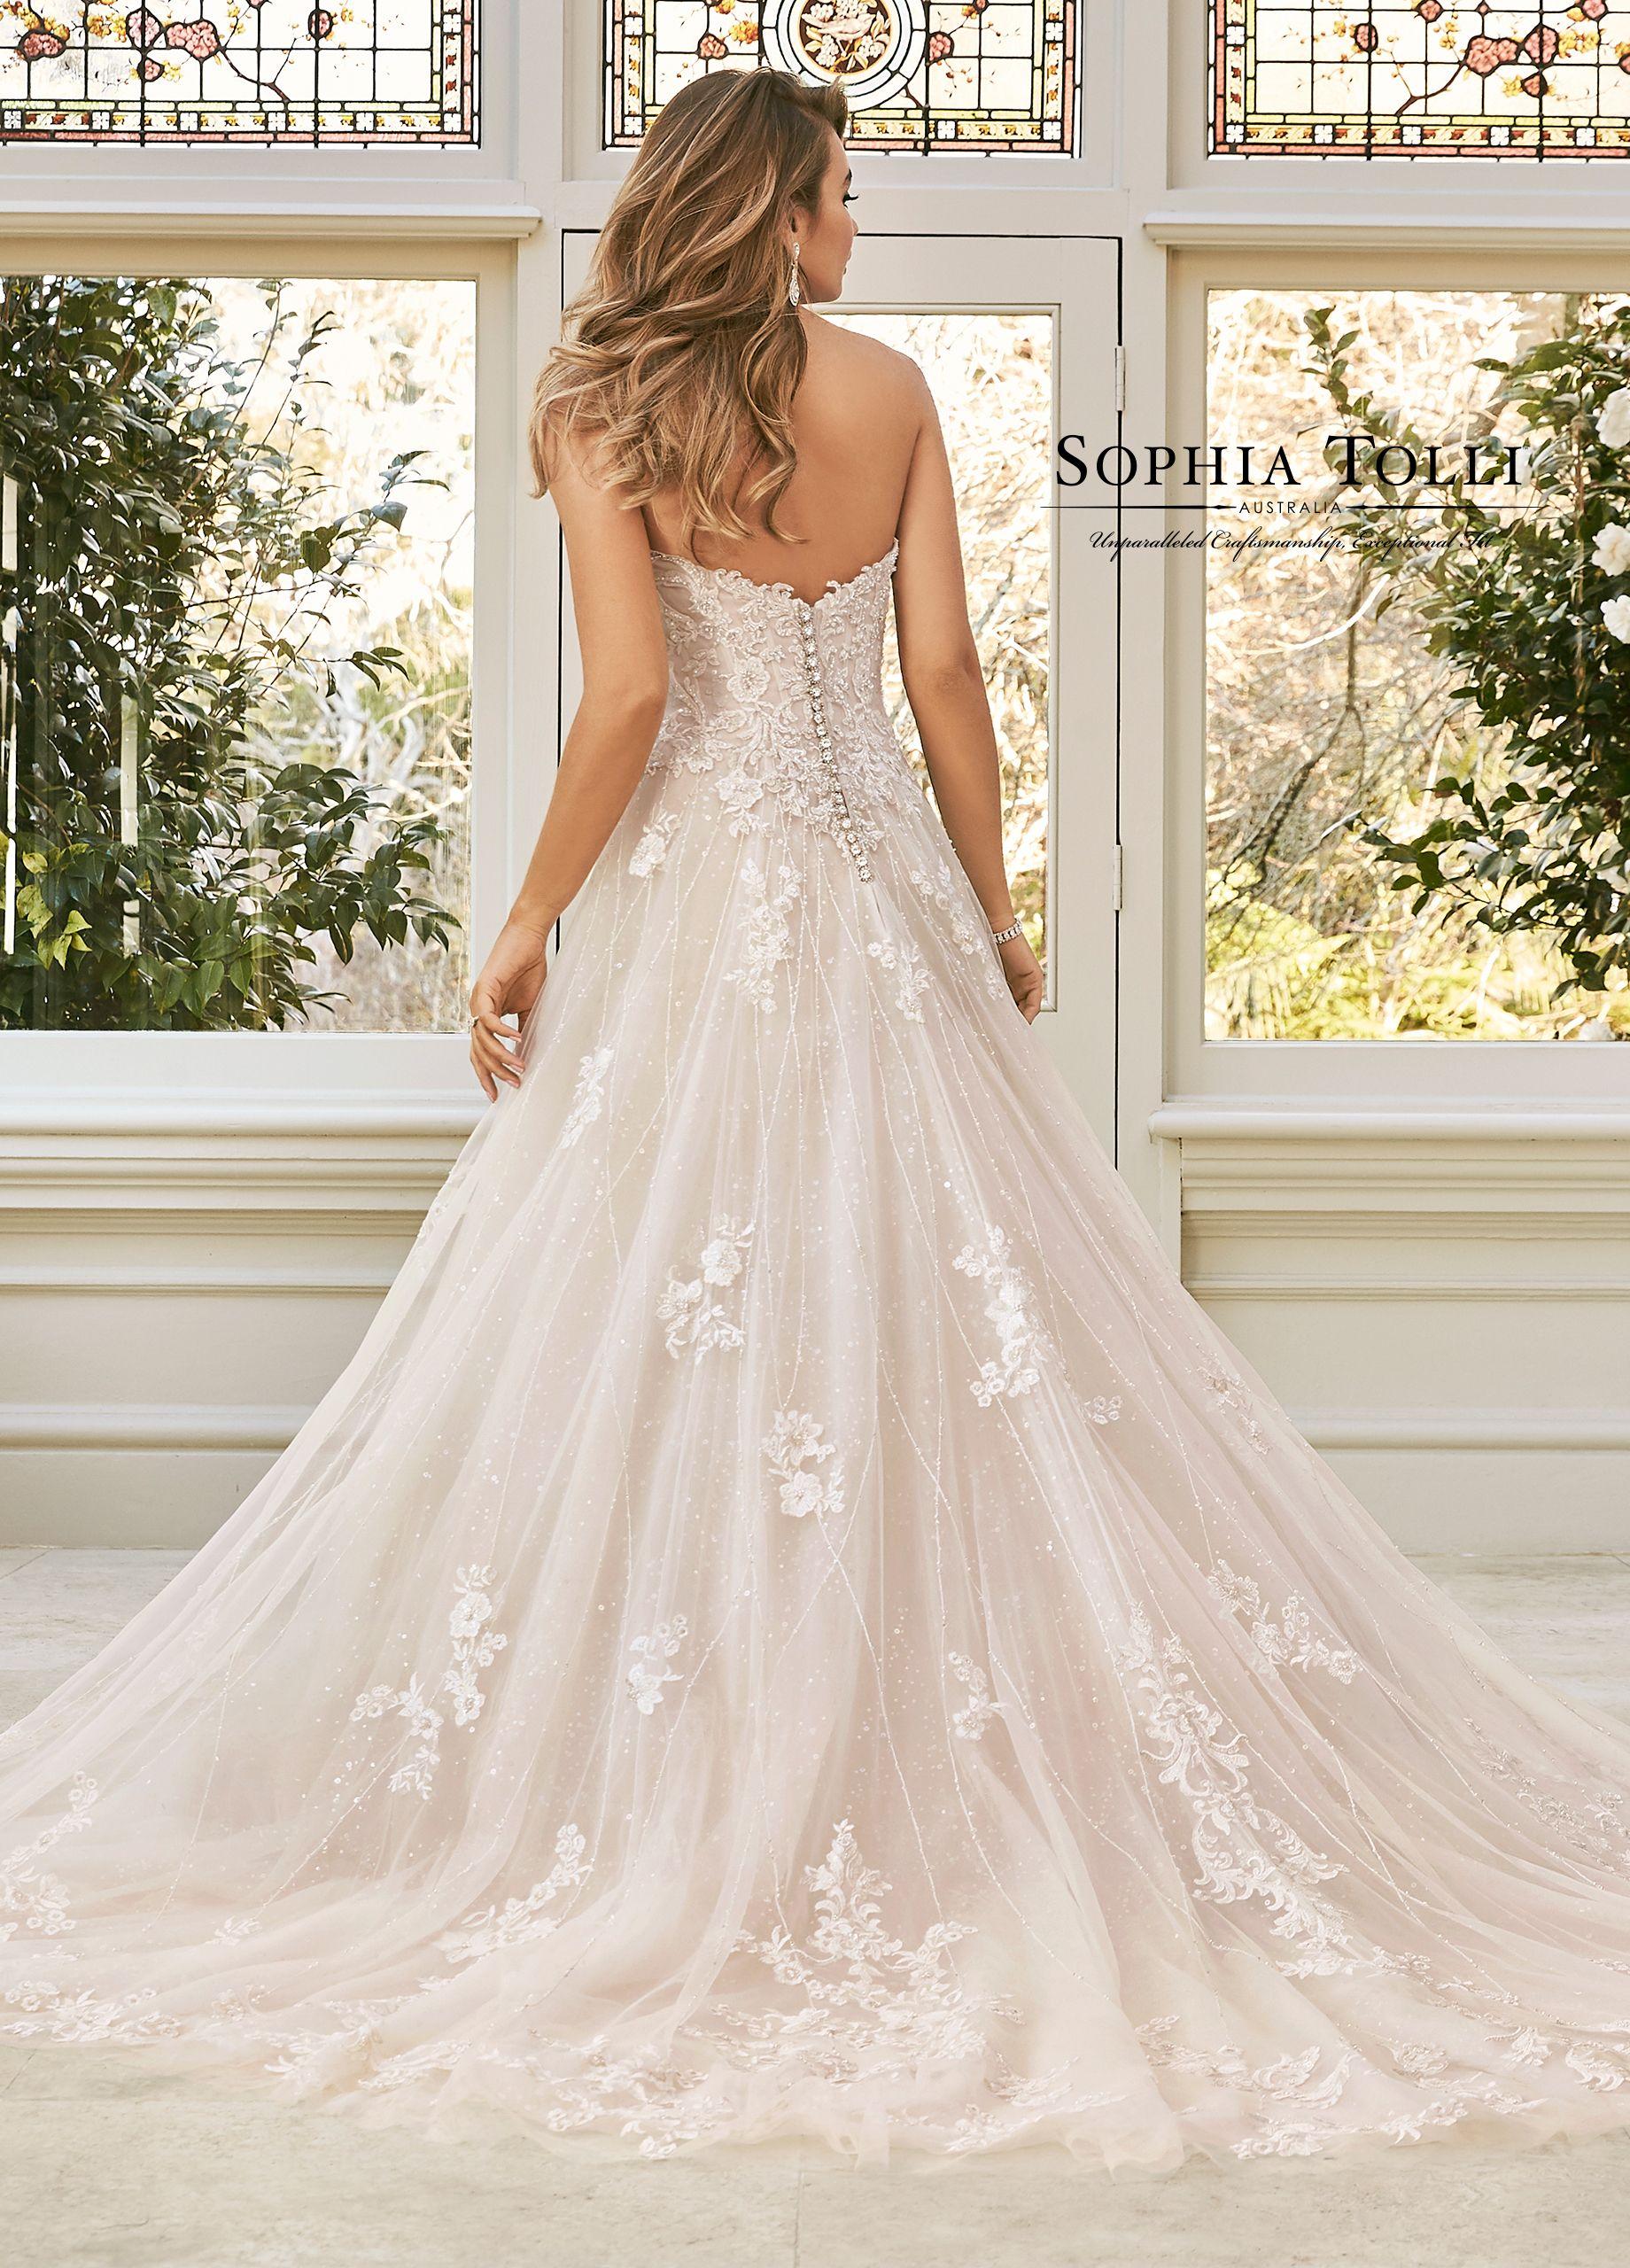 Sophia Tolli Aspen Sophia Tolli Sophia Tolli Wedding Dresses Wedding Dresses Wedding Dresses Princess Sweetheart [ 2560 x 1840 Pixel ]